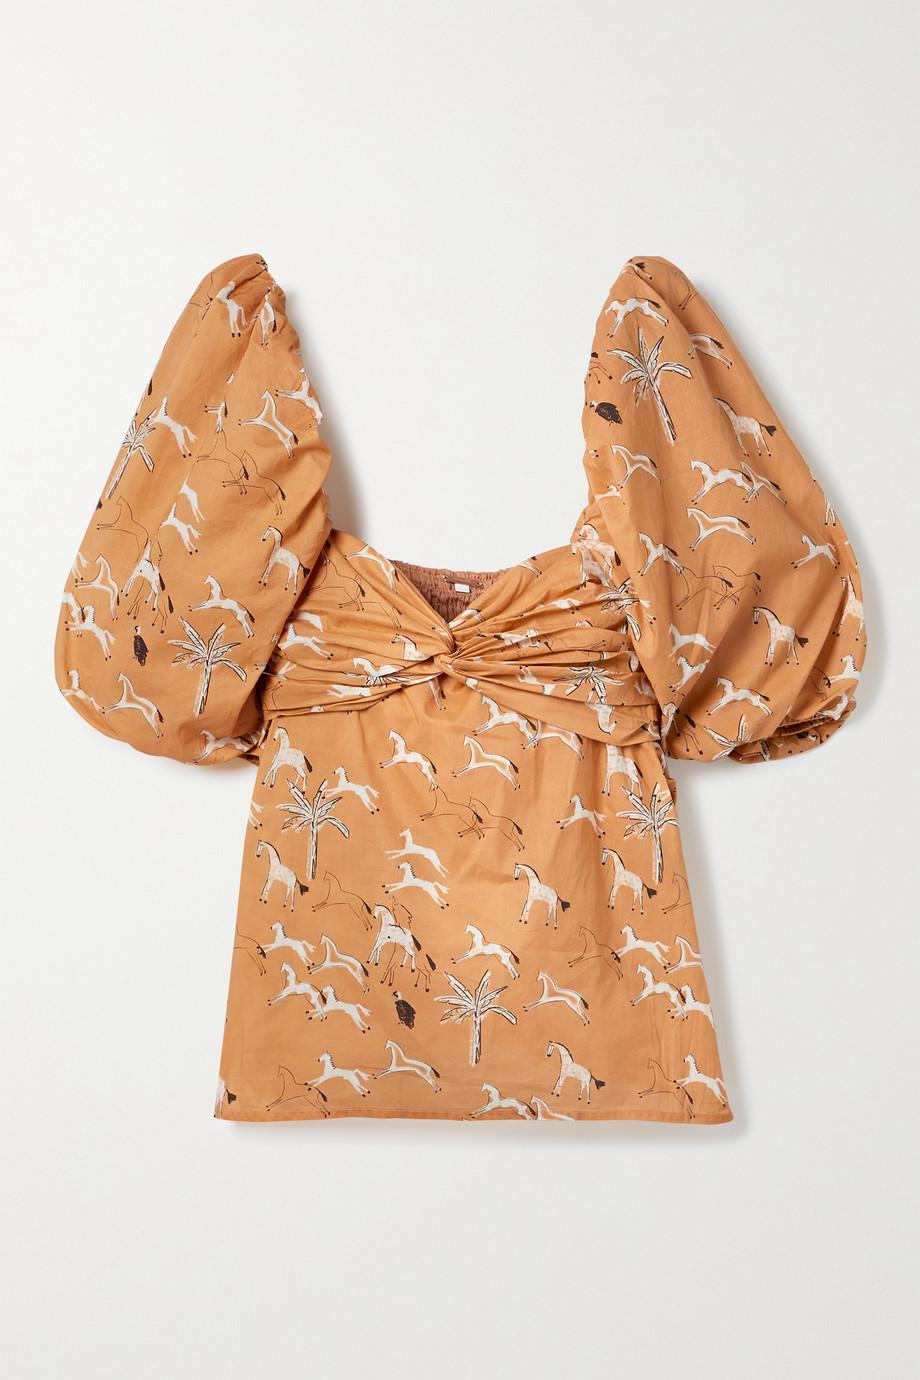 Johanna Ortiz + NET SUSTAIN Latin Gaucho printed organic cotton-poplin blouse